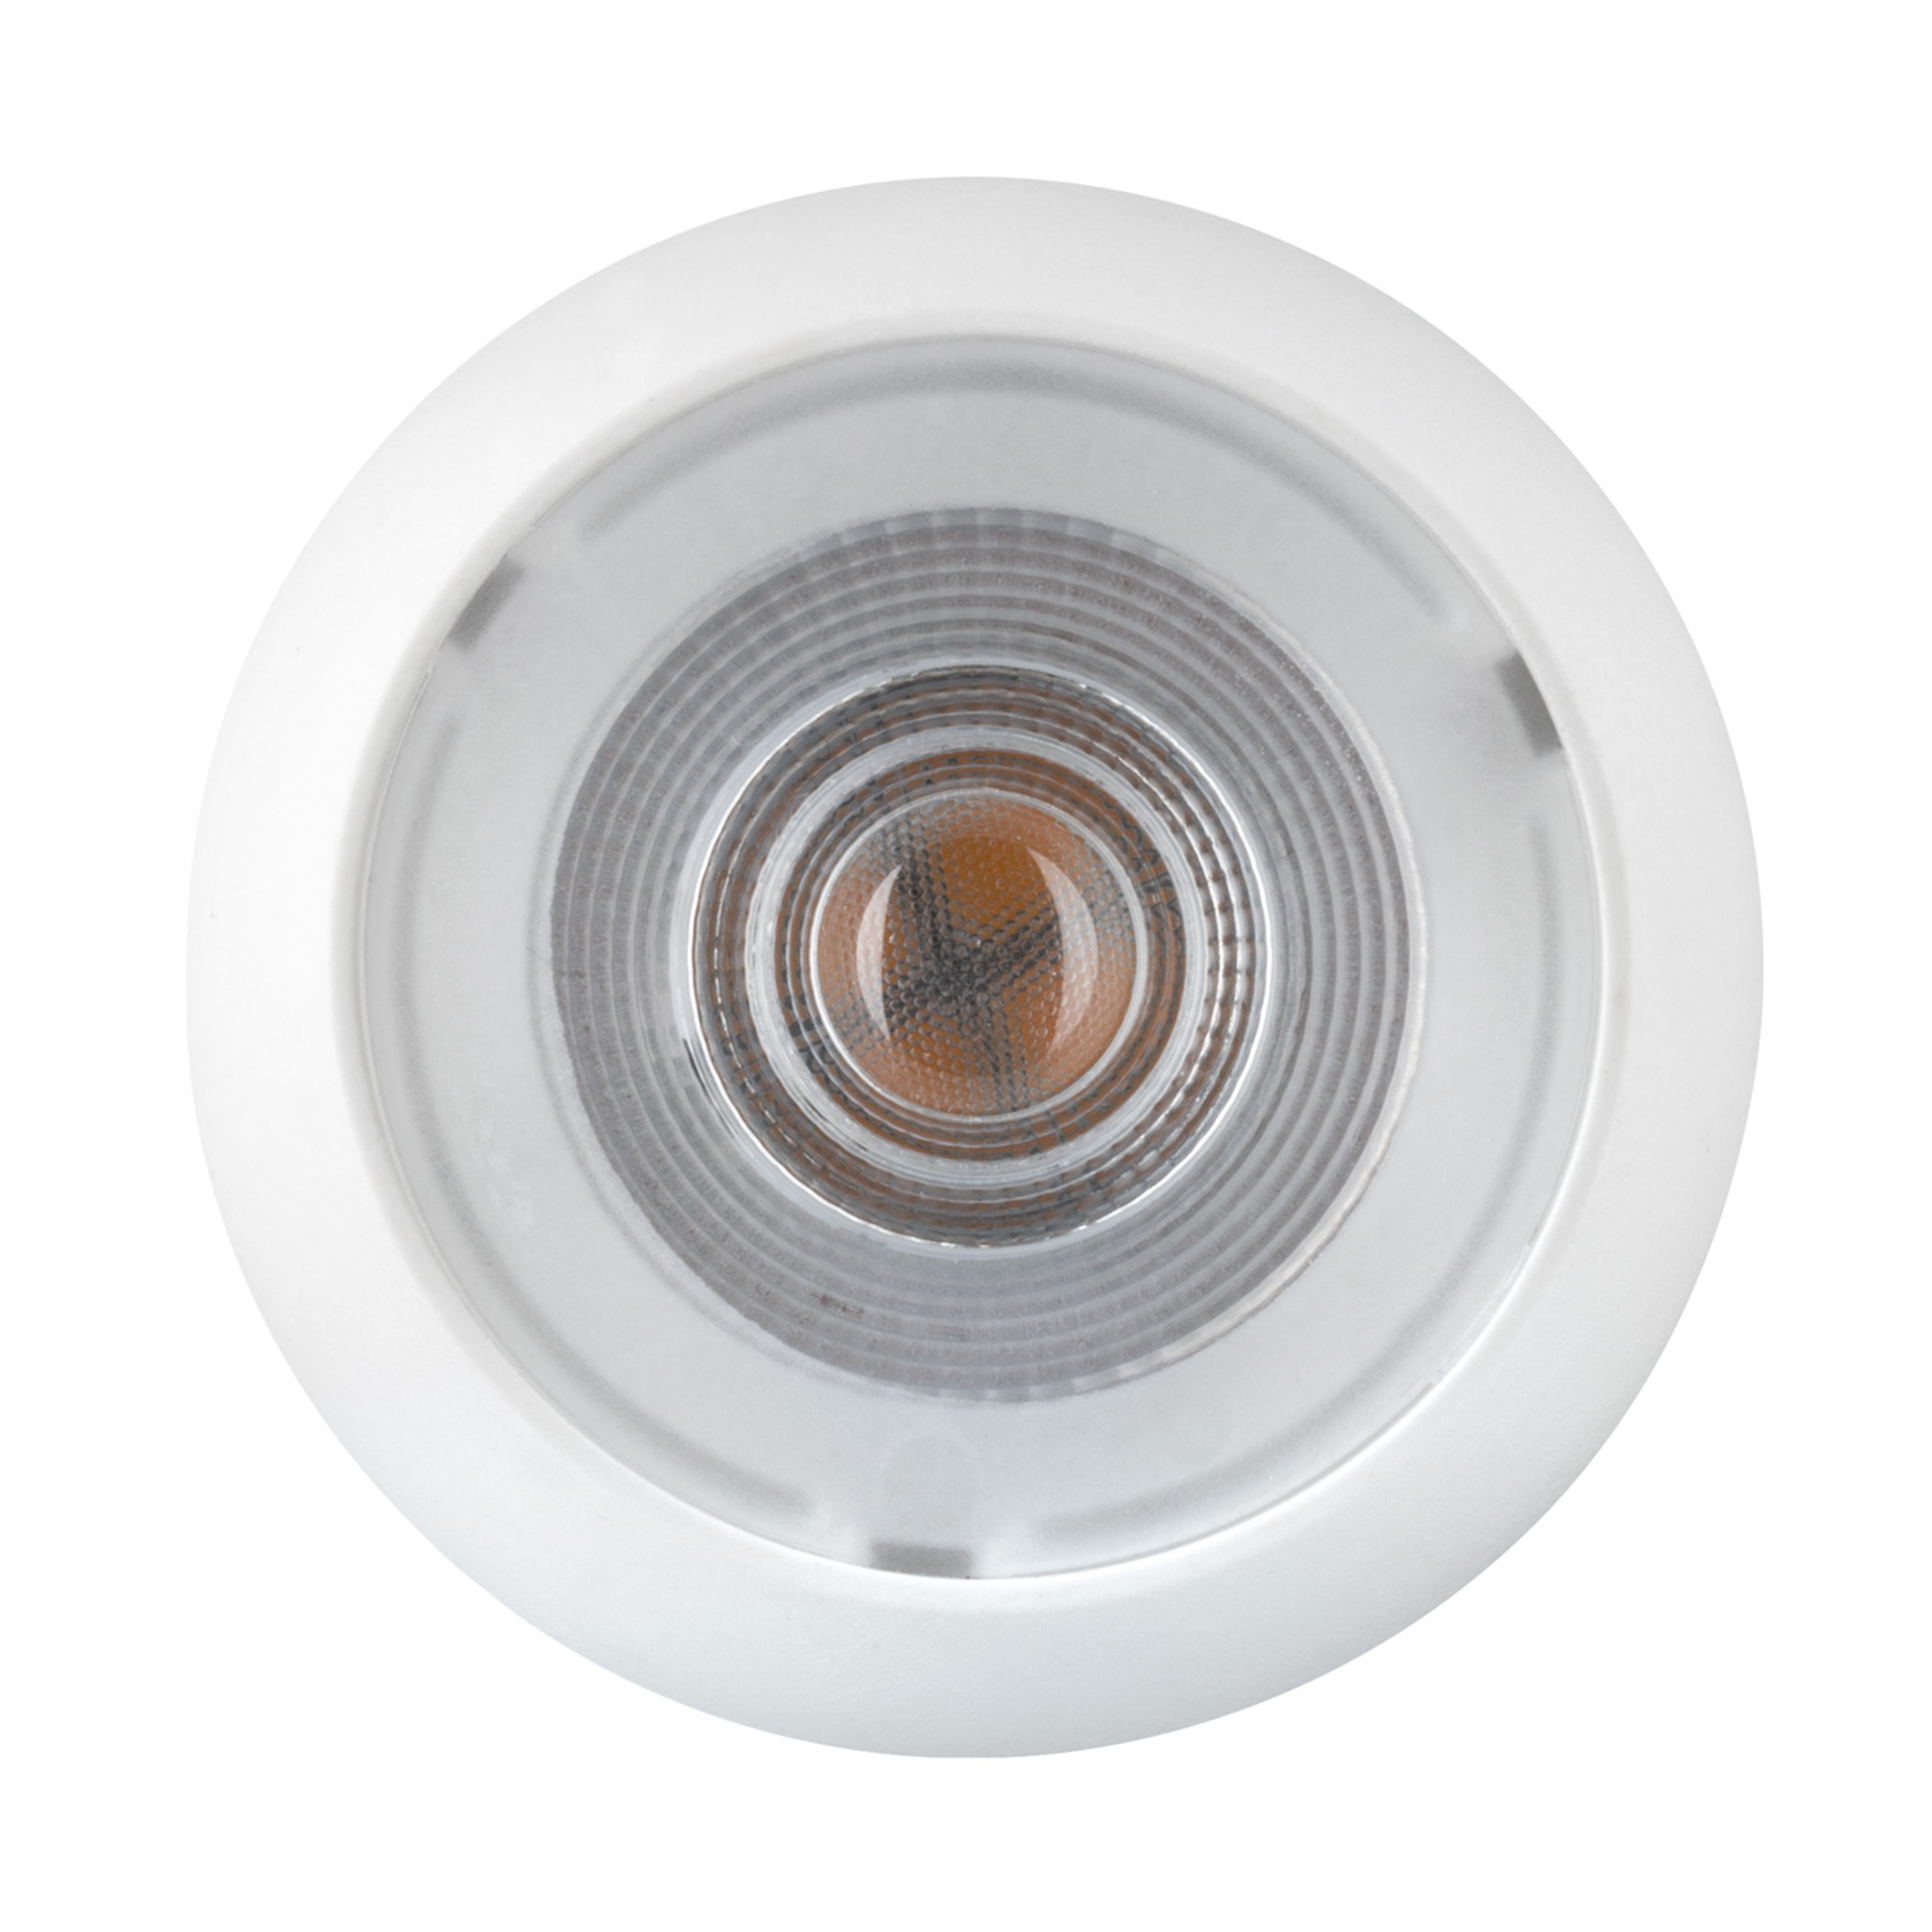 Лампа светодиодная Paulmann Рефлекторная R63 5Вт 370лм 2700K E27 230В Прозрачный 28461.